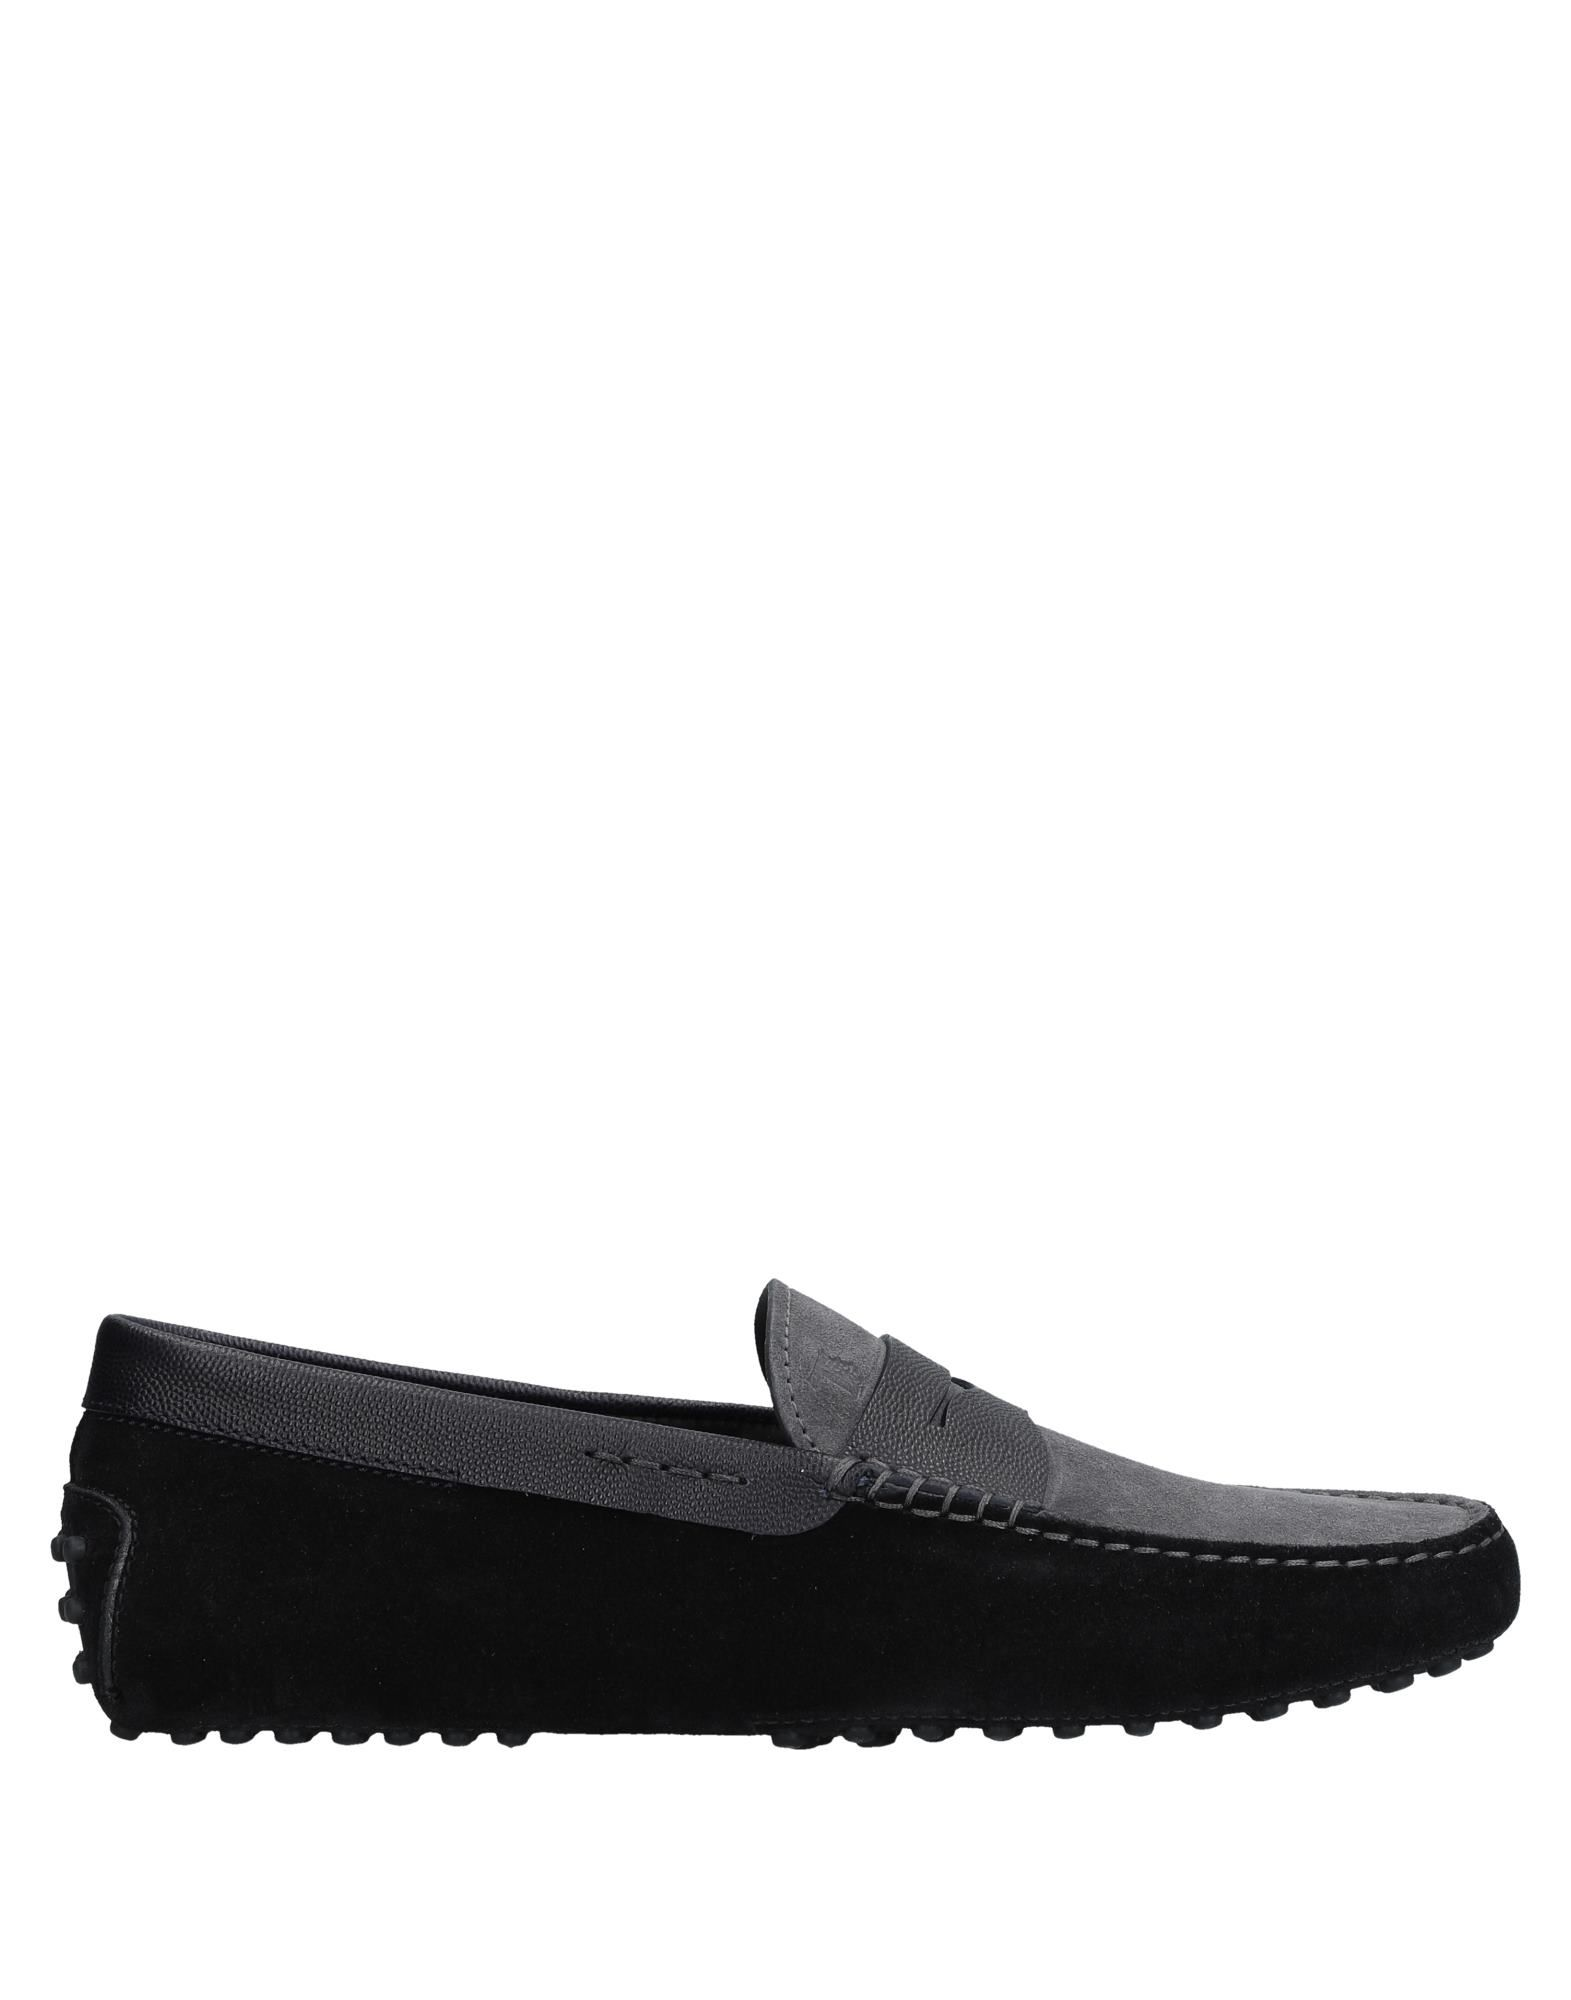 Tod's Mokassins Herren  11543198NX Gute Qualität beliebte Schuhe